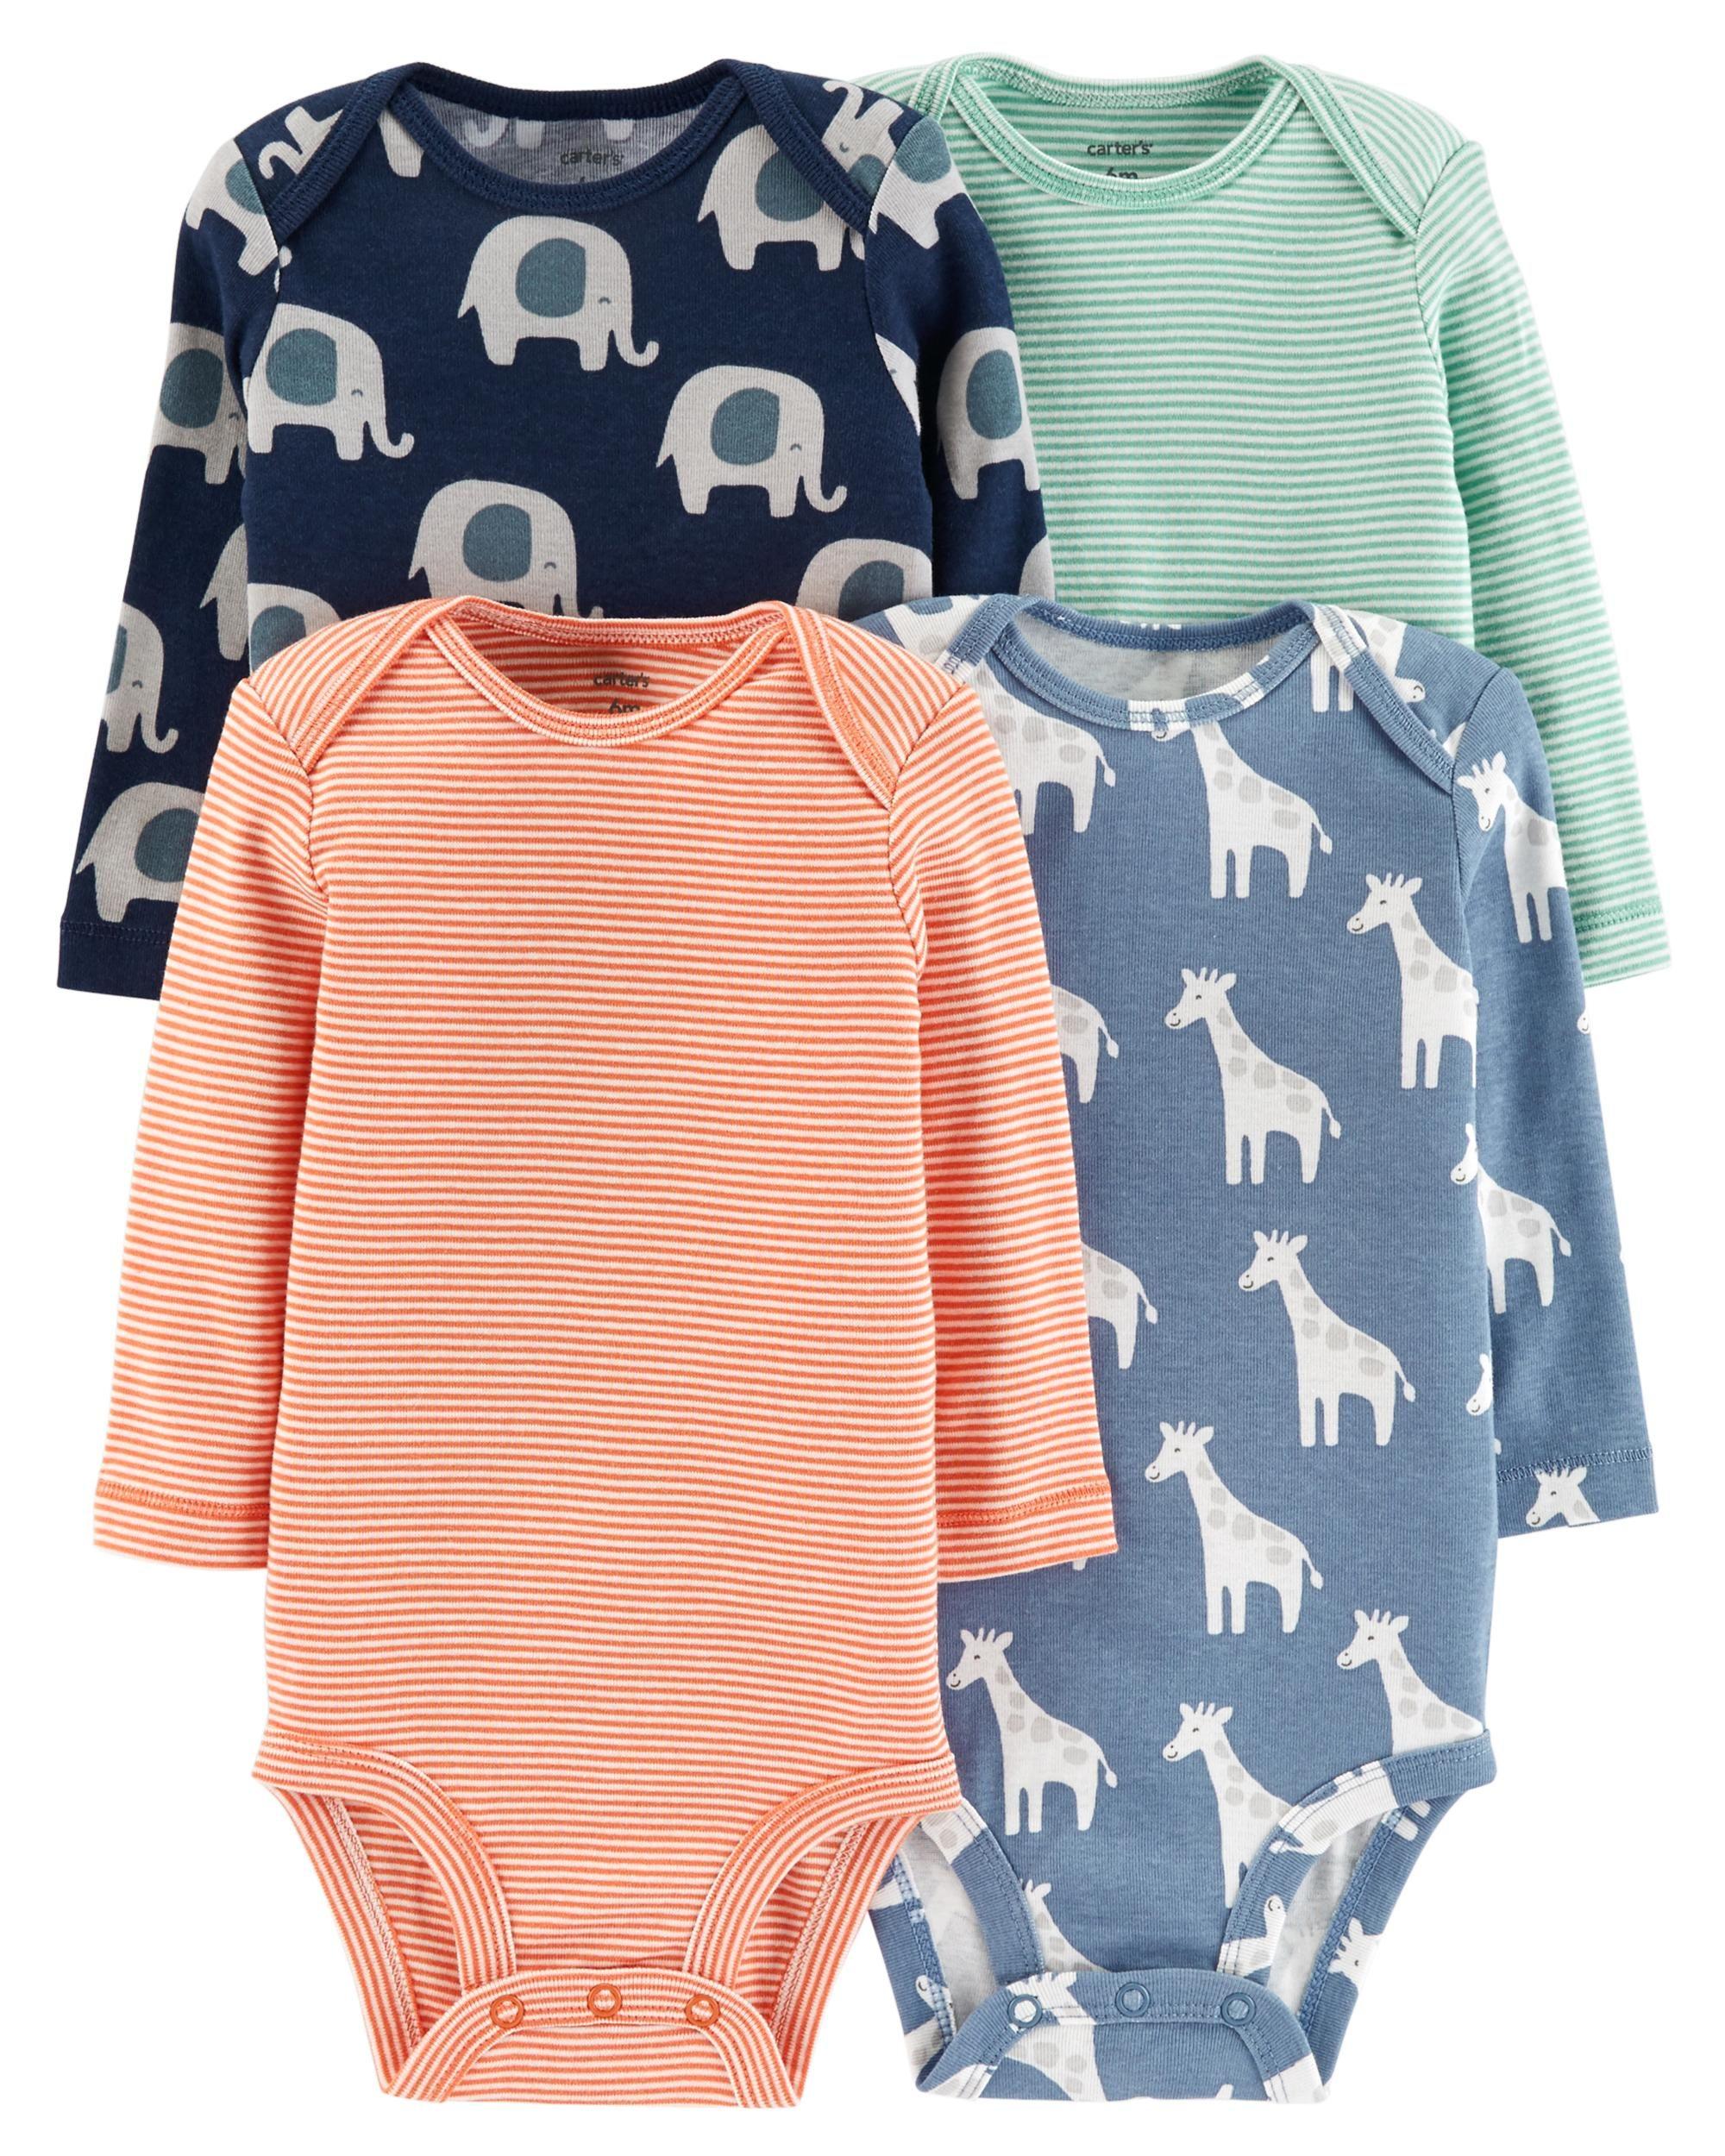 738a9462a67 Carter s Baby Boys 4 Pack Long Sleeve Bodysuits - Animal